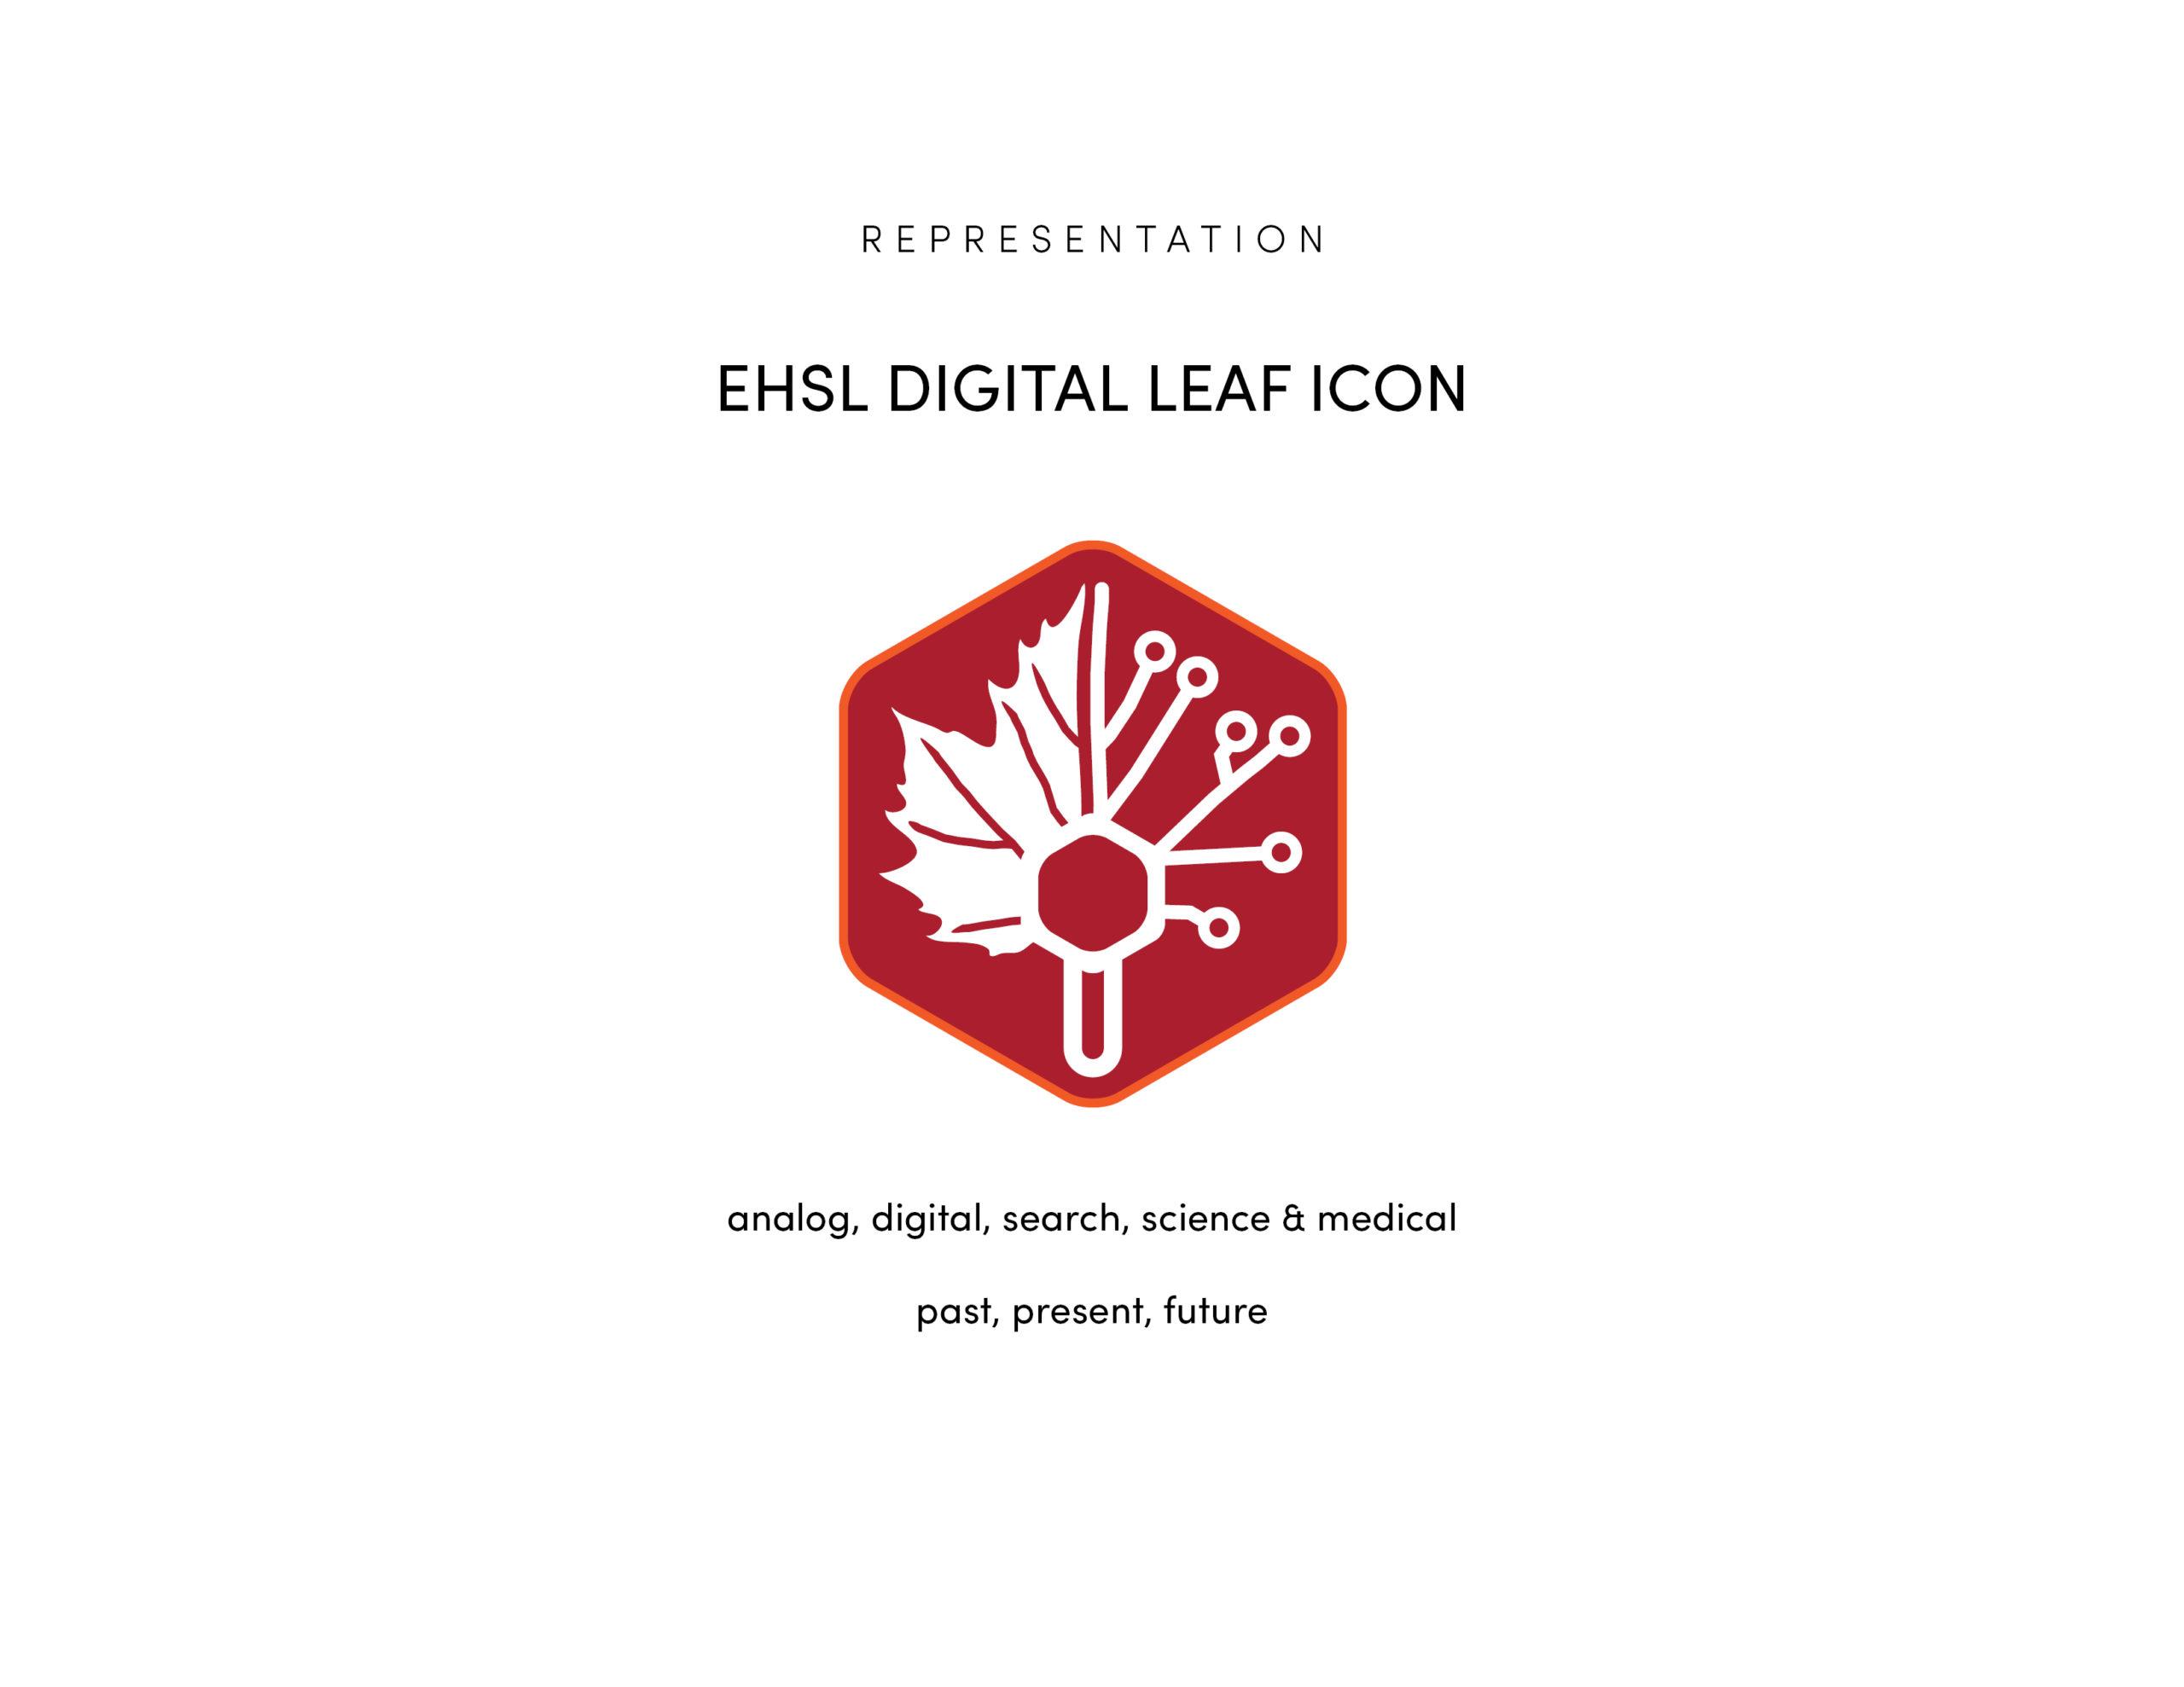 EHSL Digital Leaf, 2018 by Peter Strohmeyer